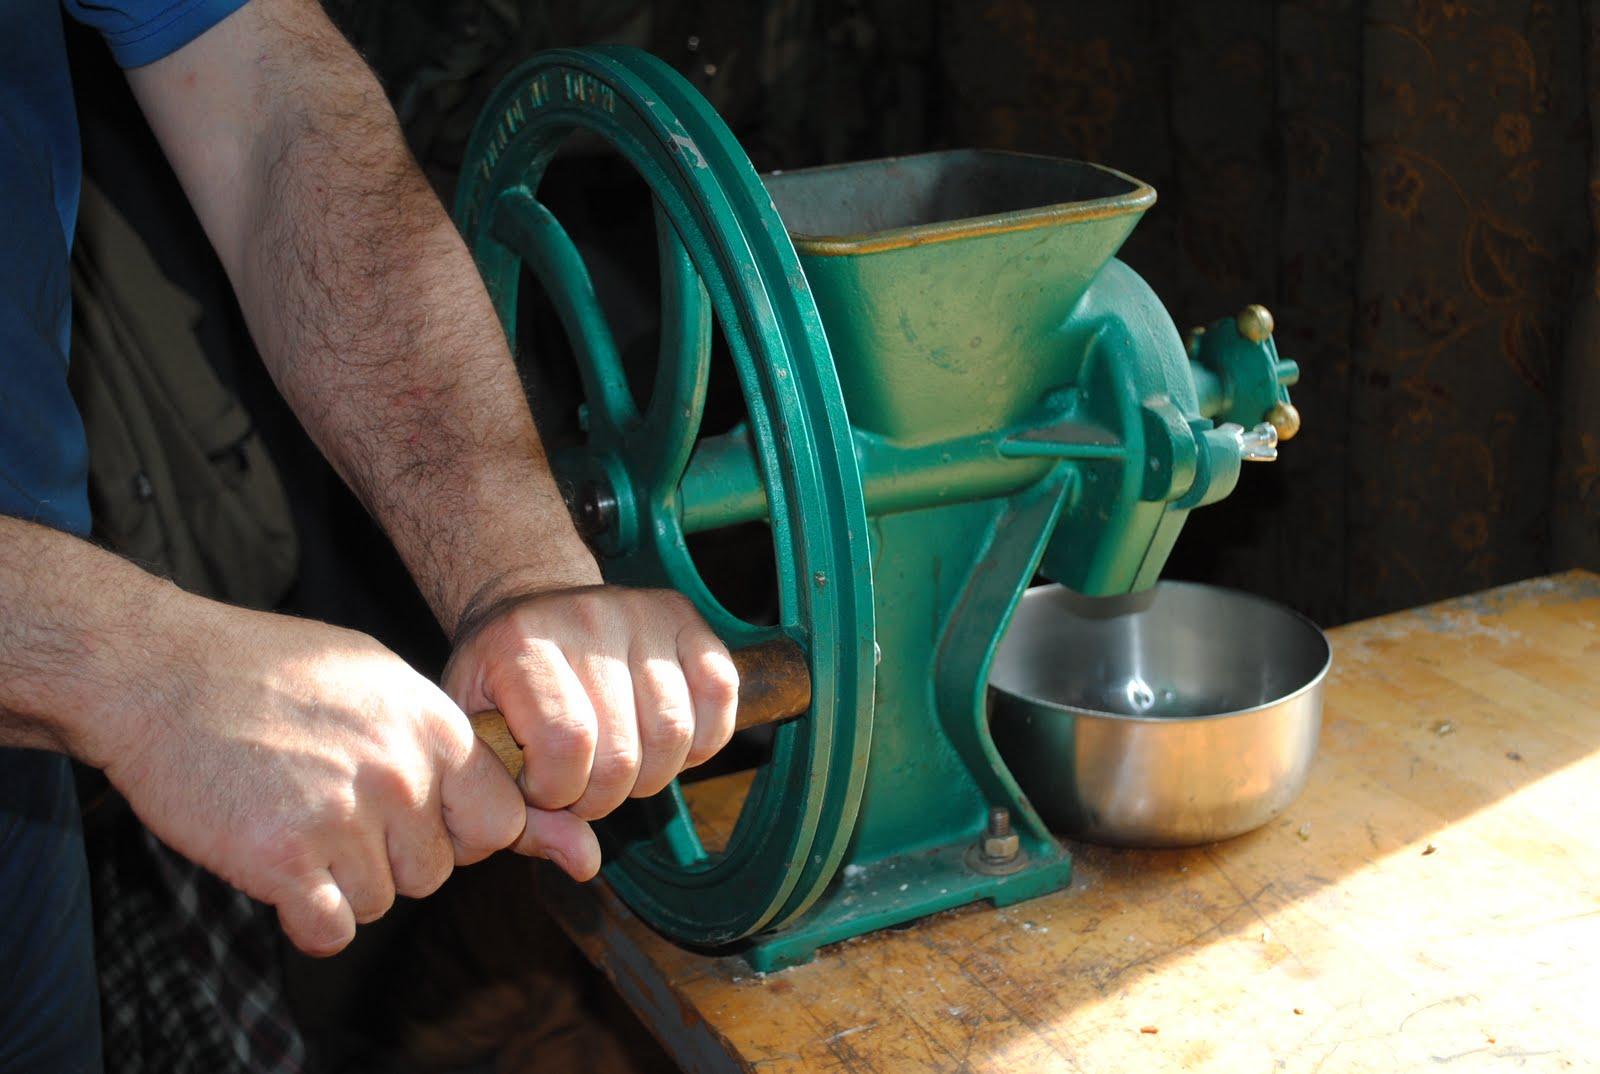 equipment review diamant grain grinder - Grain Grinder